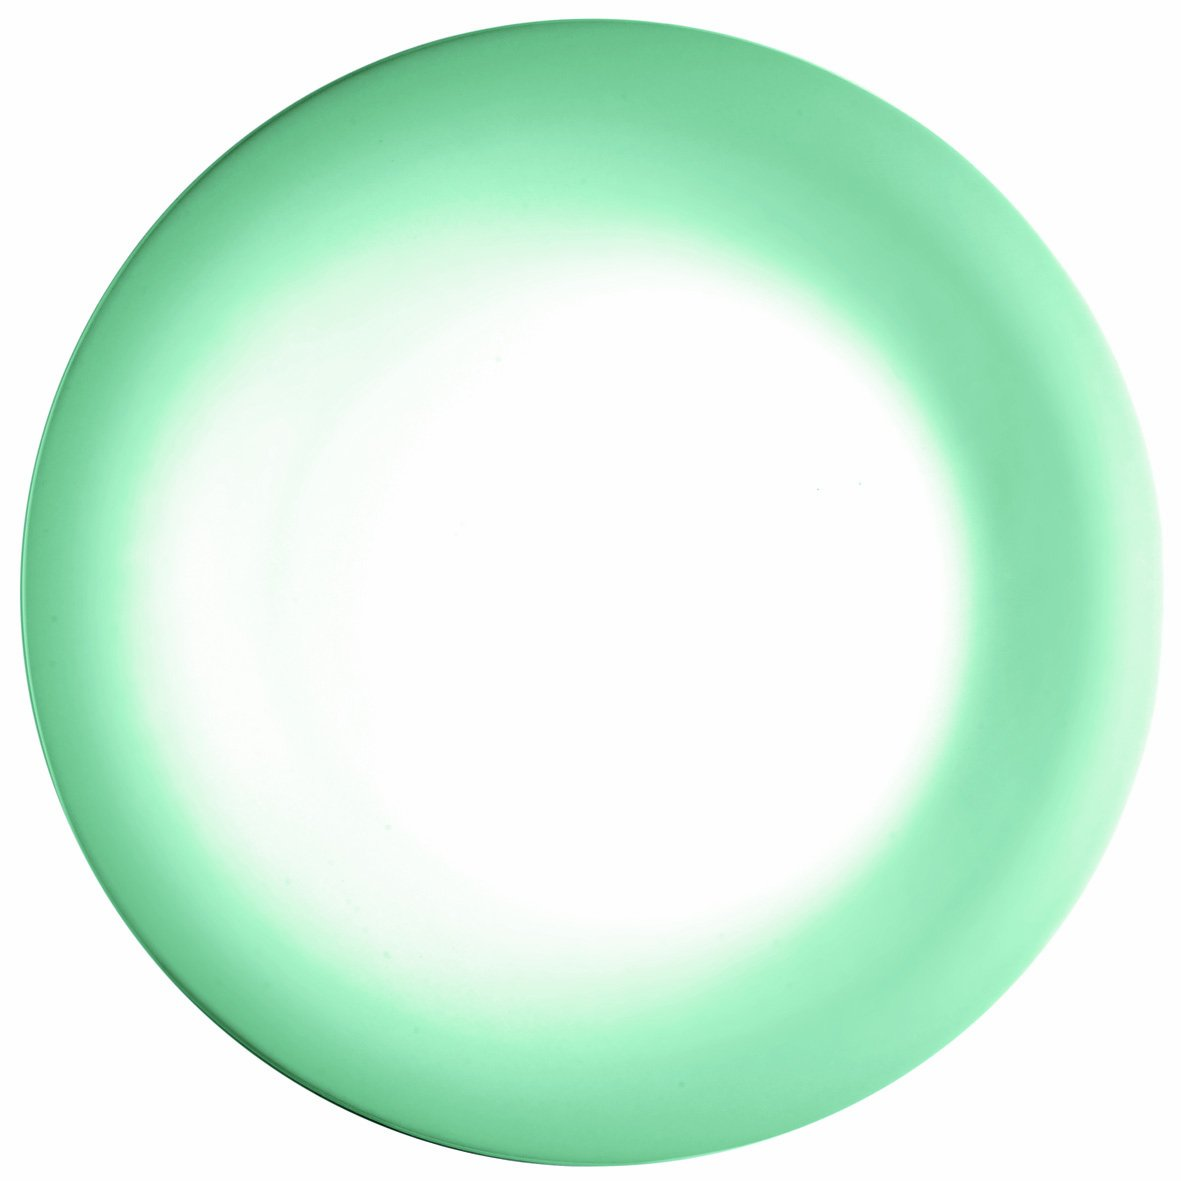 Guzzini 29760086 Bowl Porcelain, 27 cm, Jade Green/Green